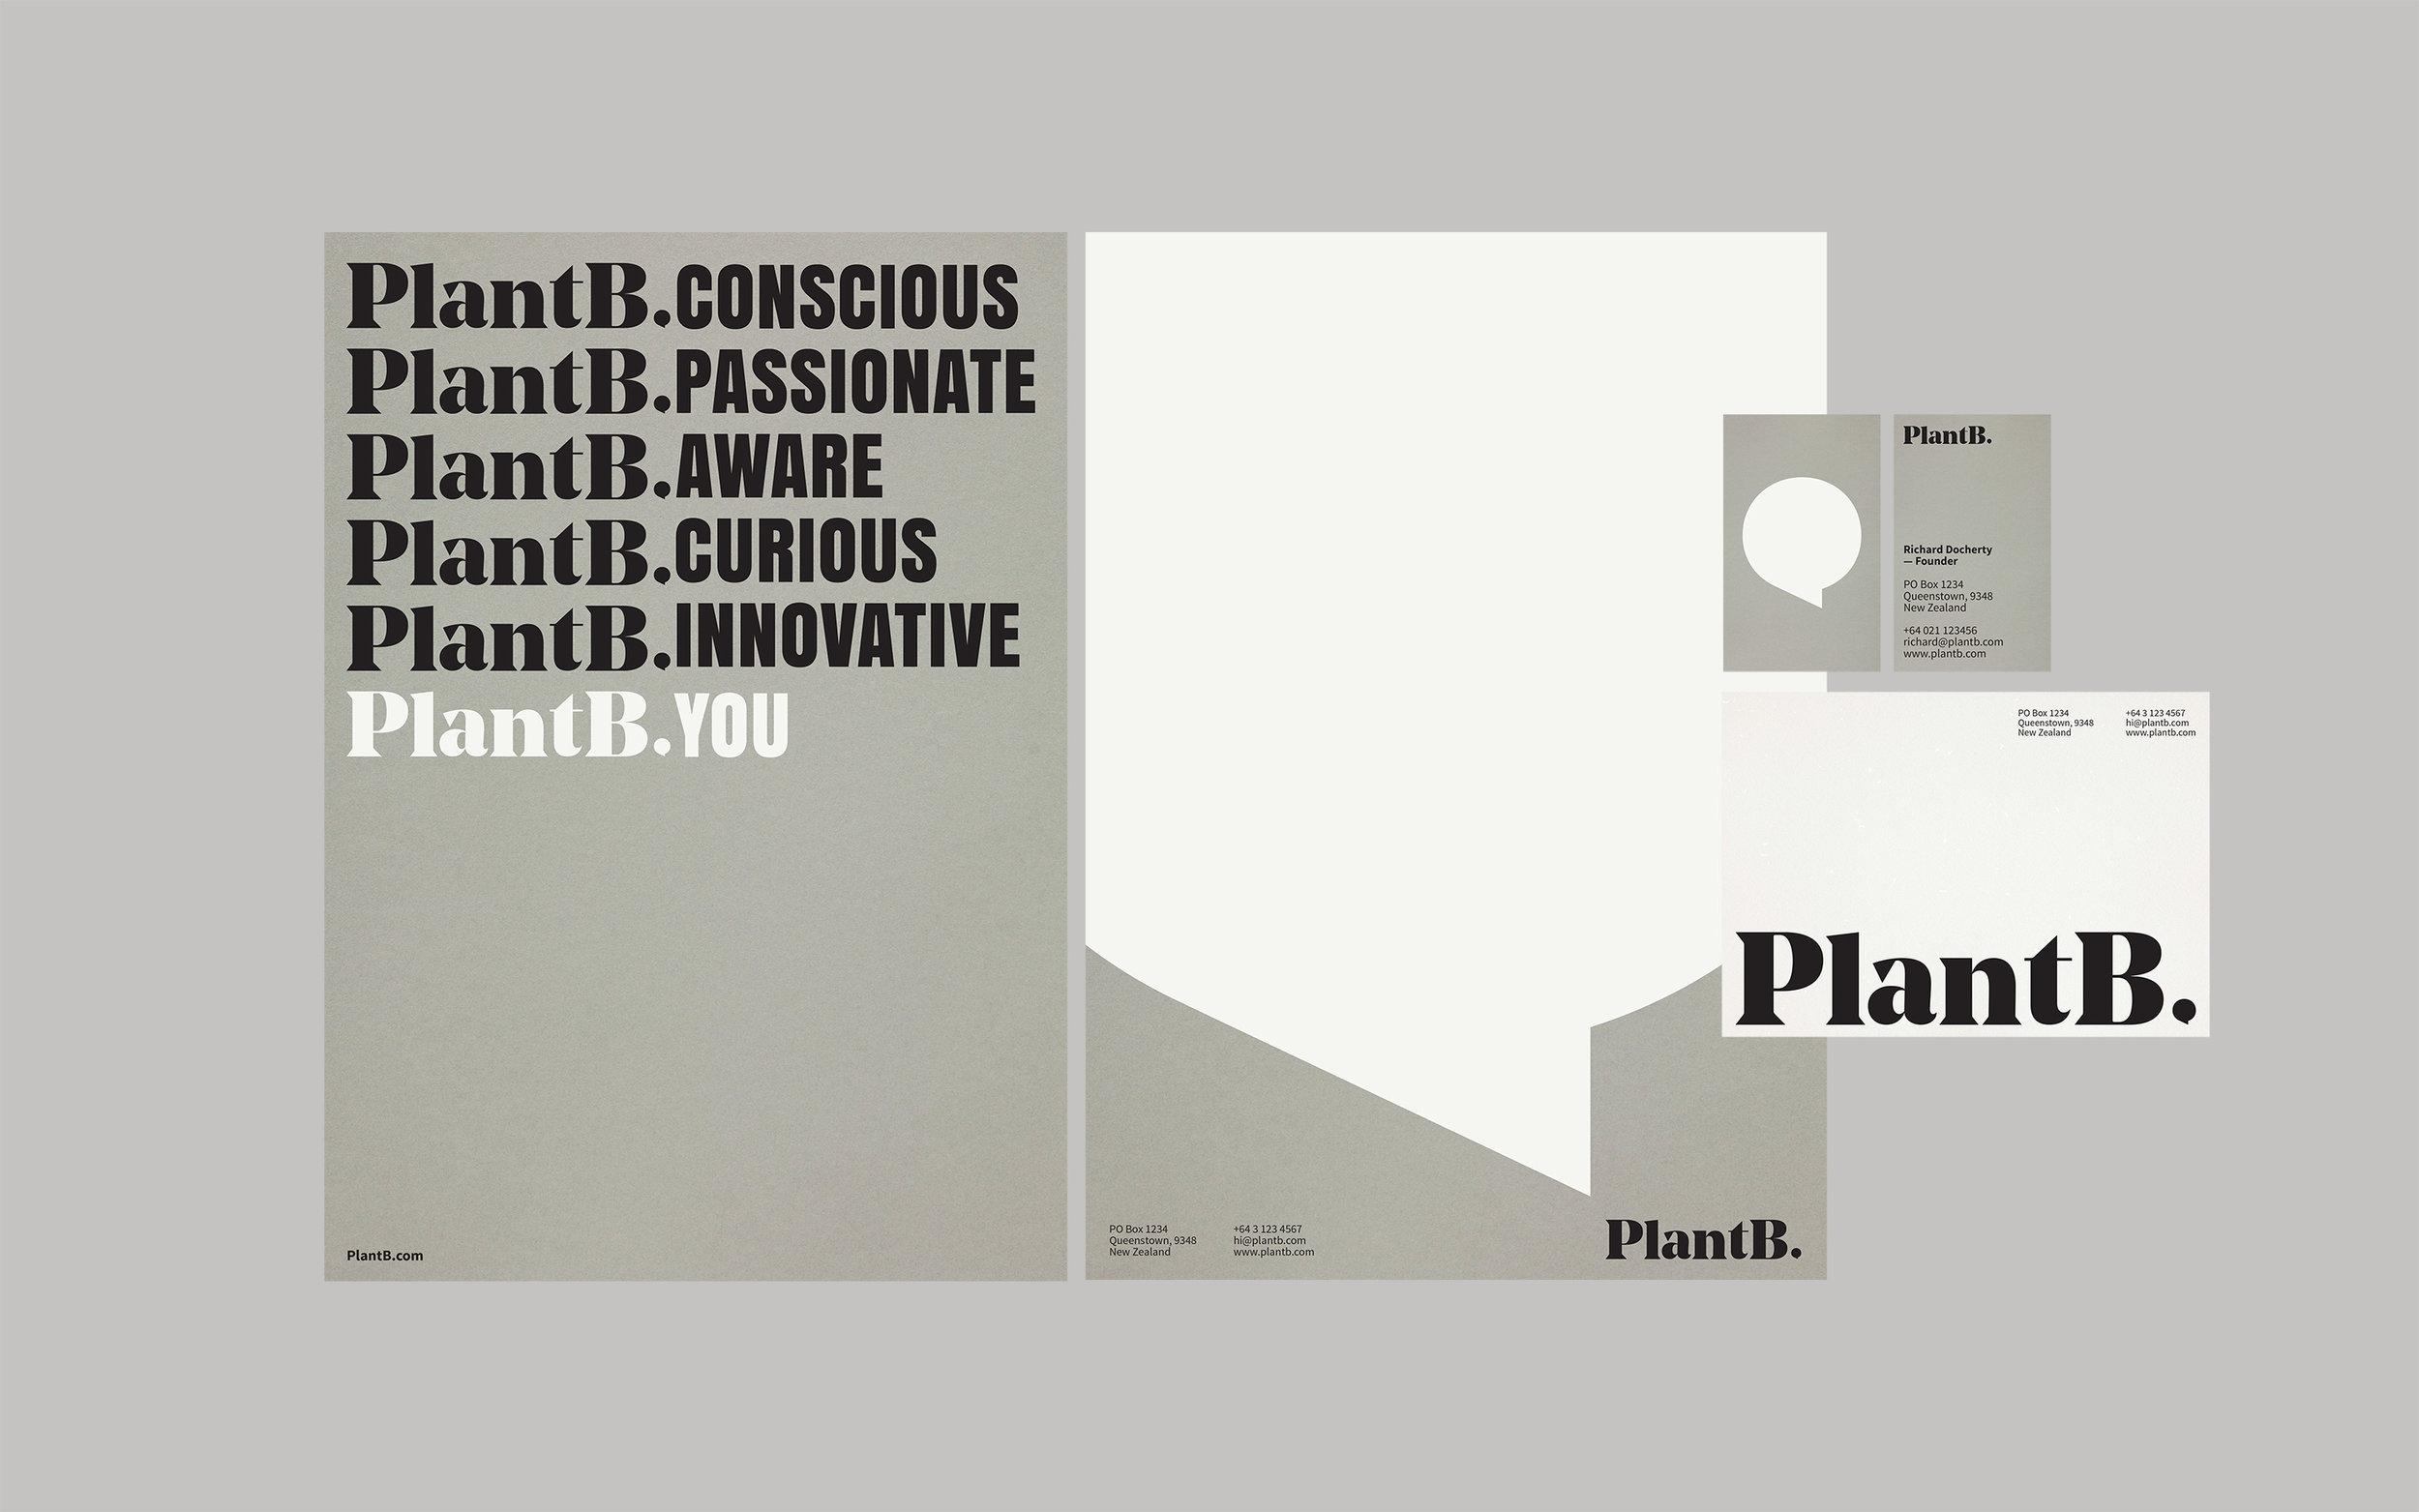 Presenatation-PlantB-3.jpg